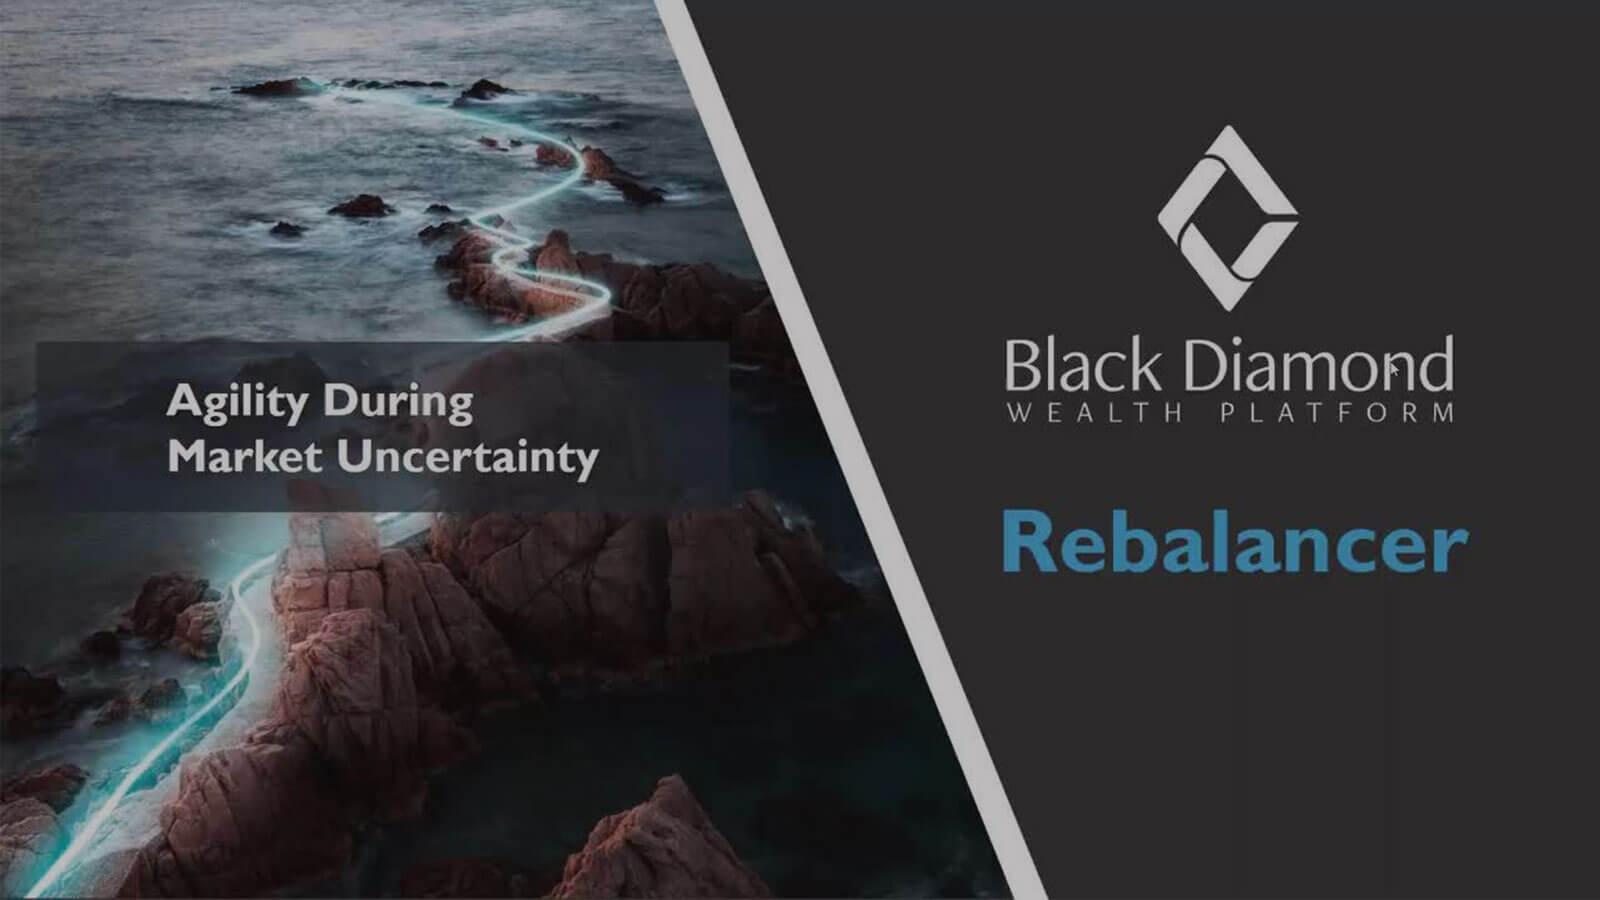 poster image for Black Diamond Rebalancer: Agility during market uncertainty